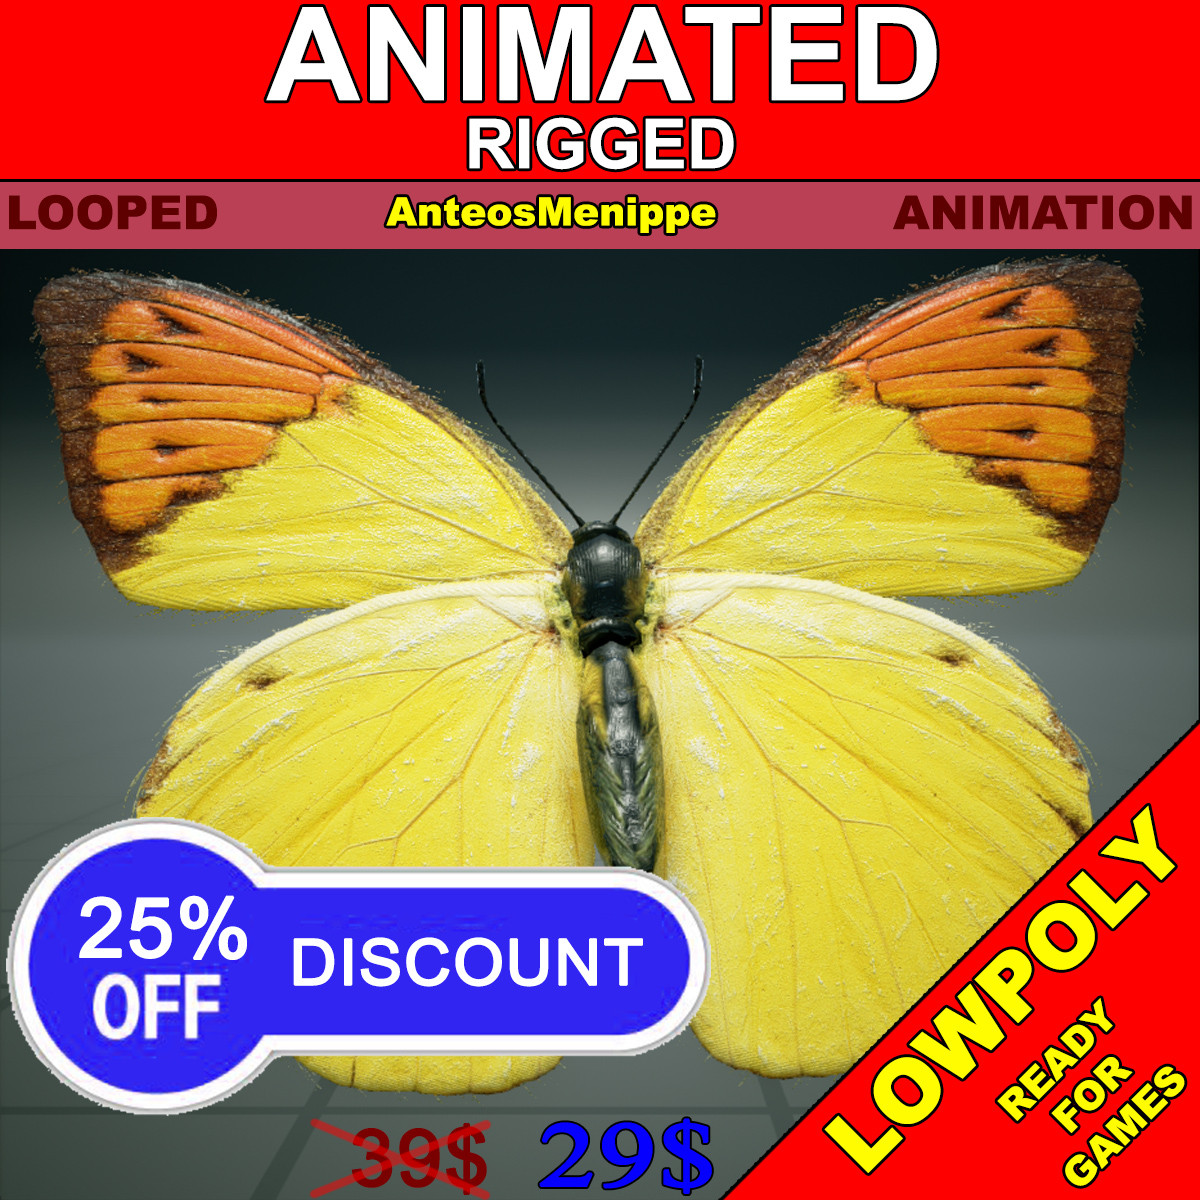 AnteosMenippe_Oblojka_Discount(TurboSquid).jpg